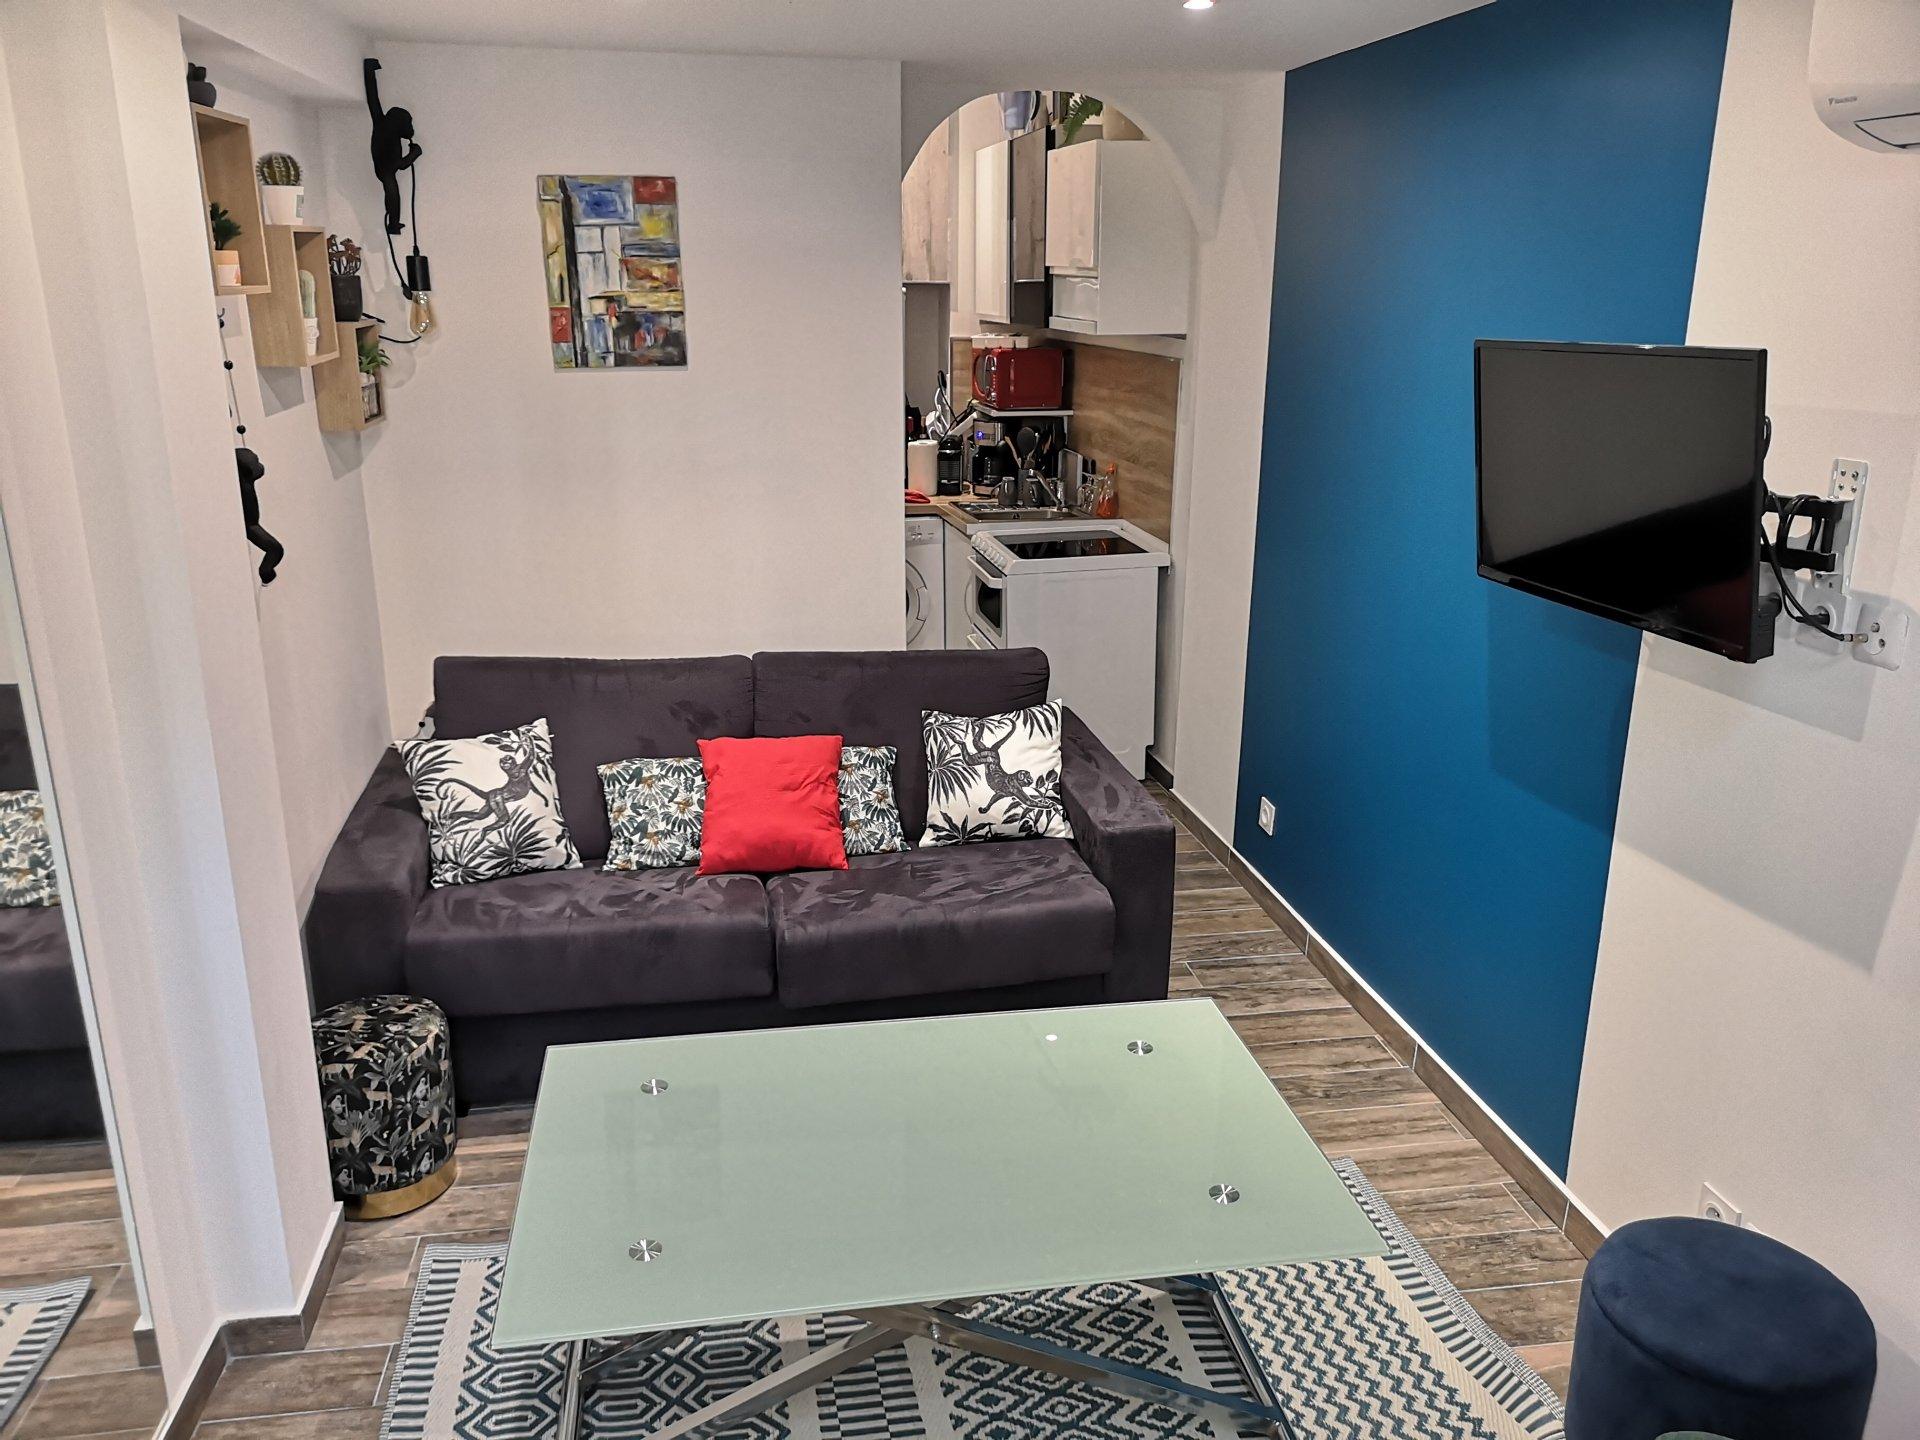 Vendita Appartamento - Nizza (Nice) Place Masséna